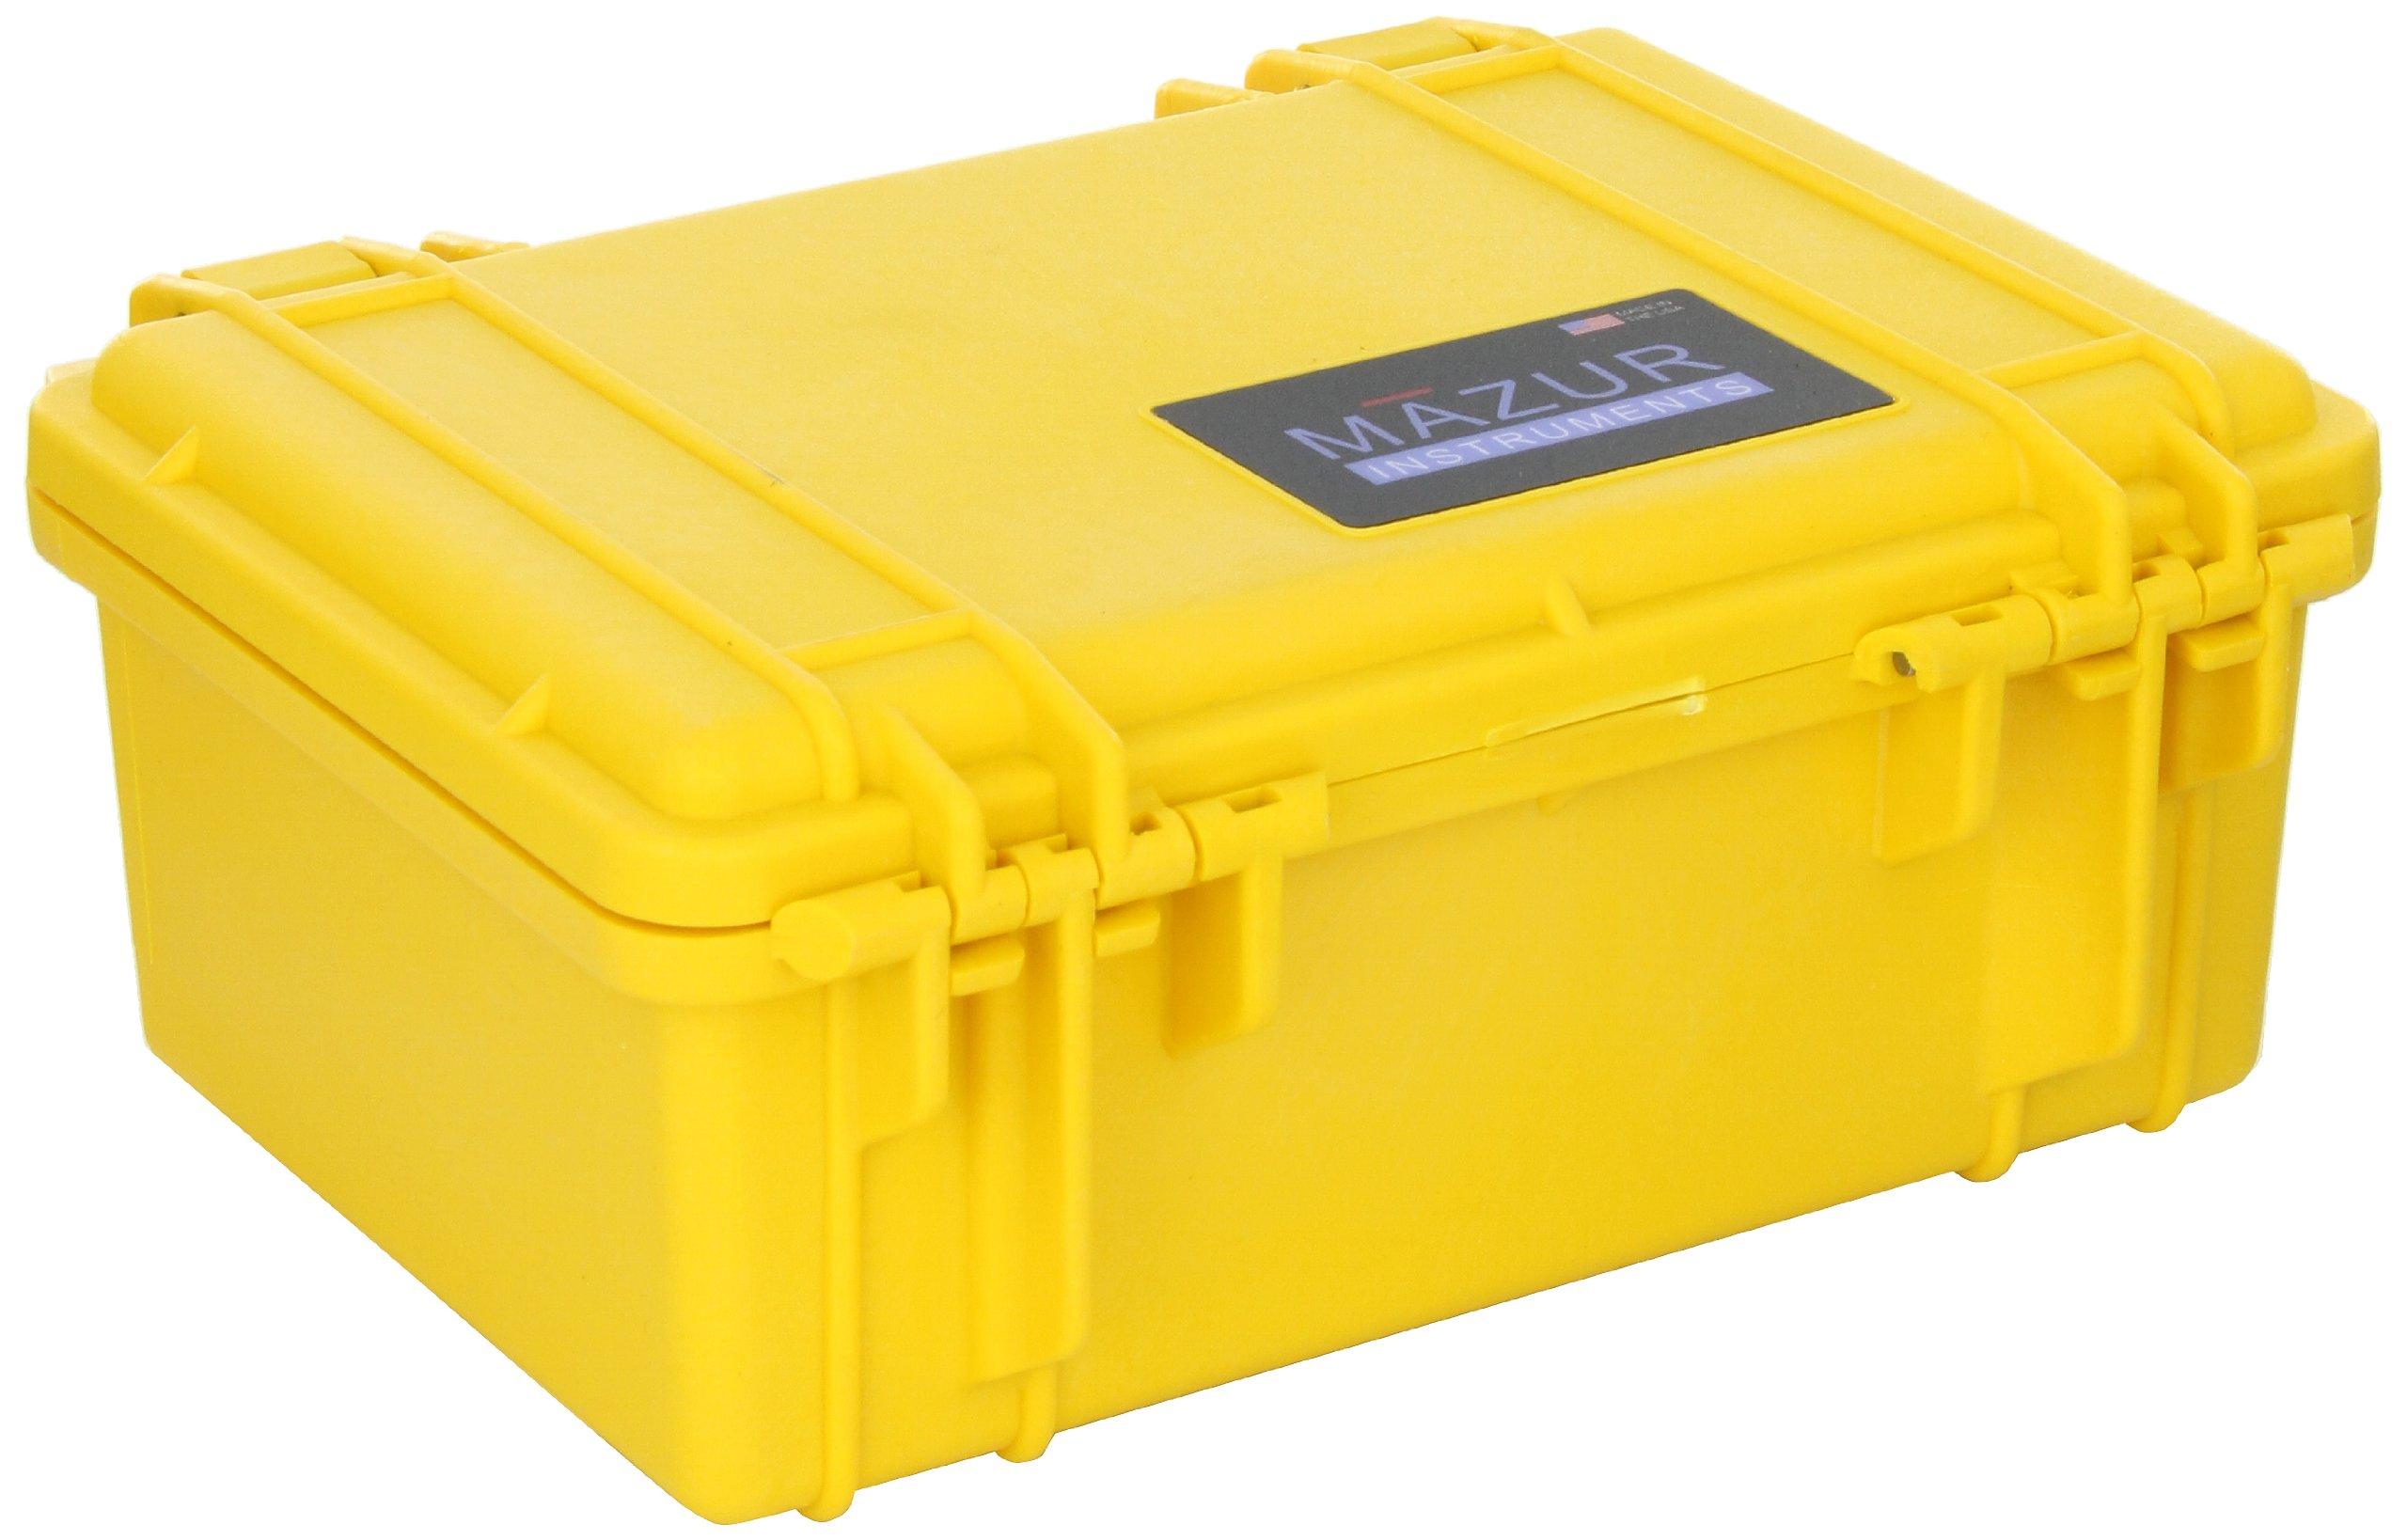 Mazur Instruments PRM-HC-YL Pelican PRM Hard Field Case, 7-1/4'' Length x 4-3/4'' Width, Yellow by Mazur Instruments (Image #2)